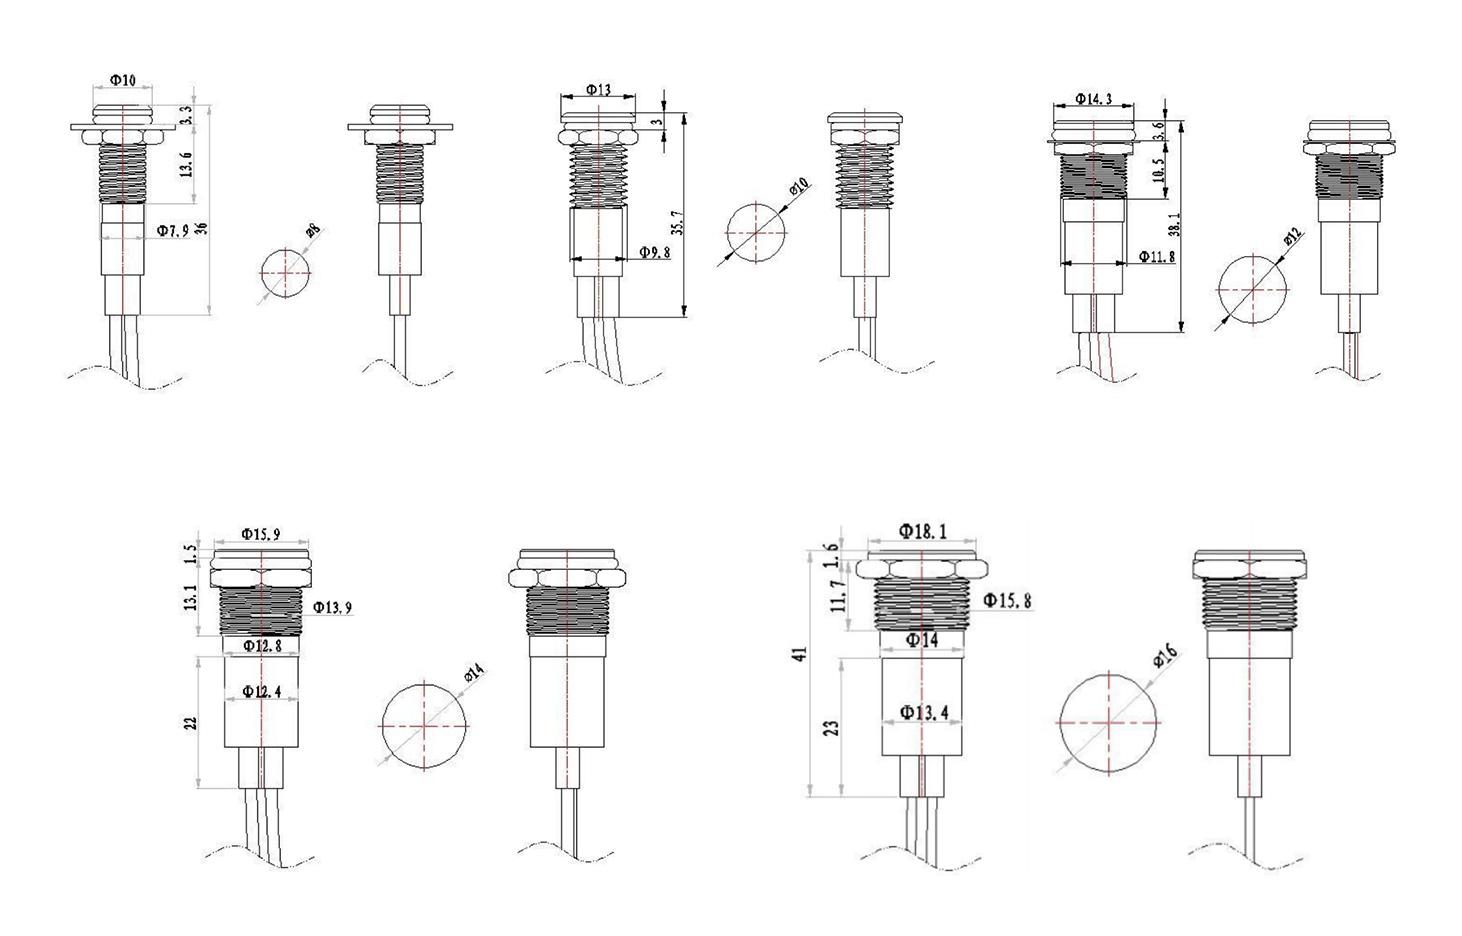 Indicator light drawing